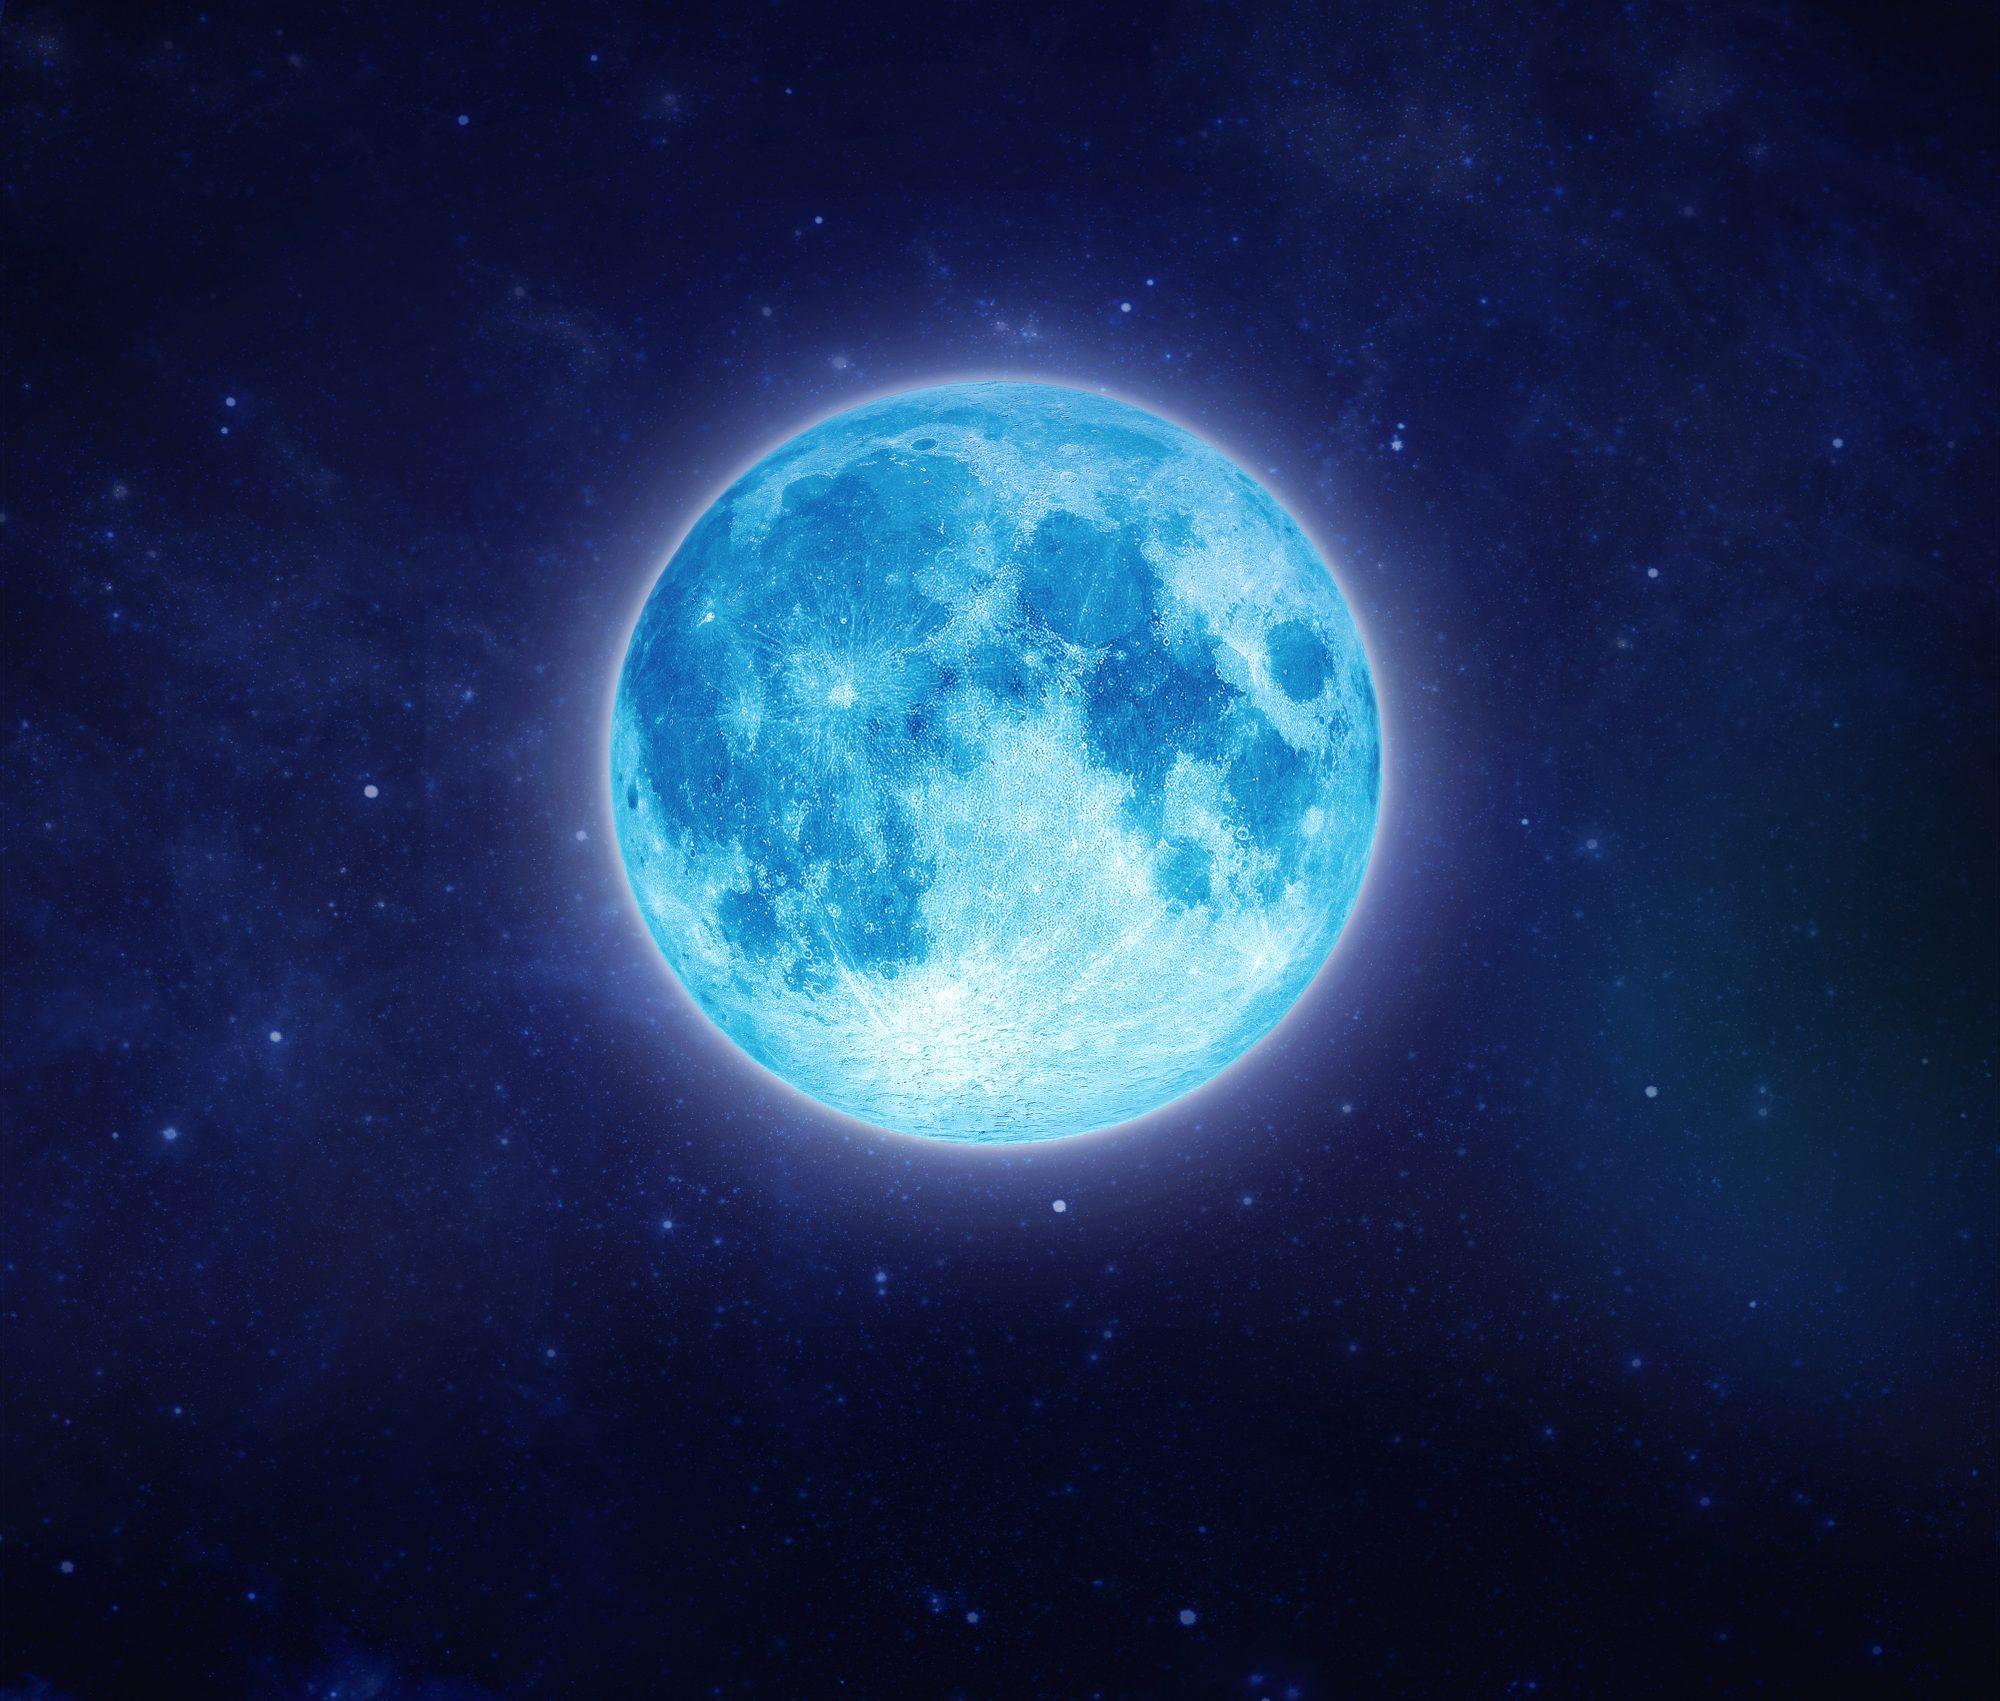 Image of full blue moon